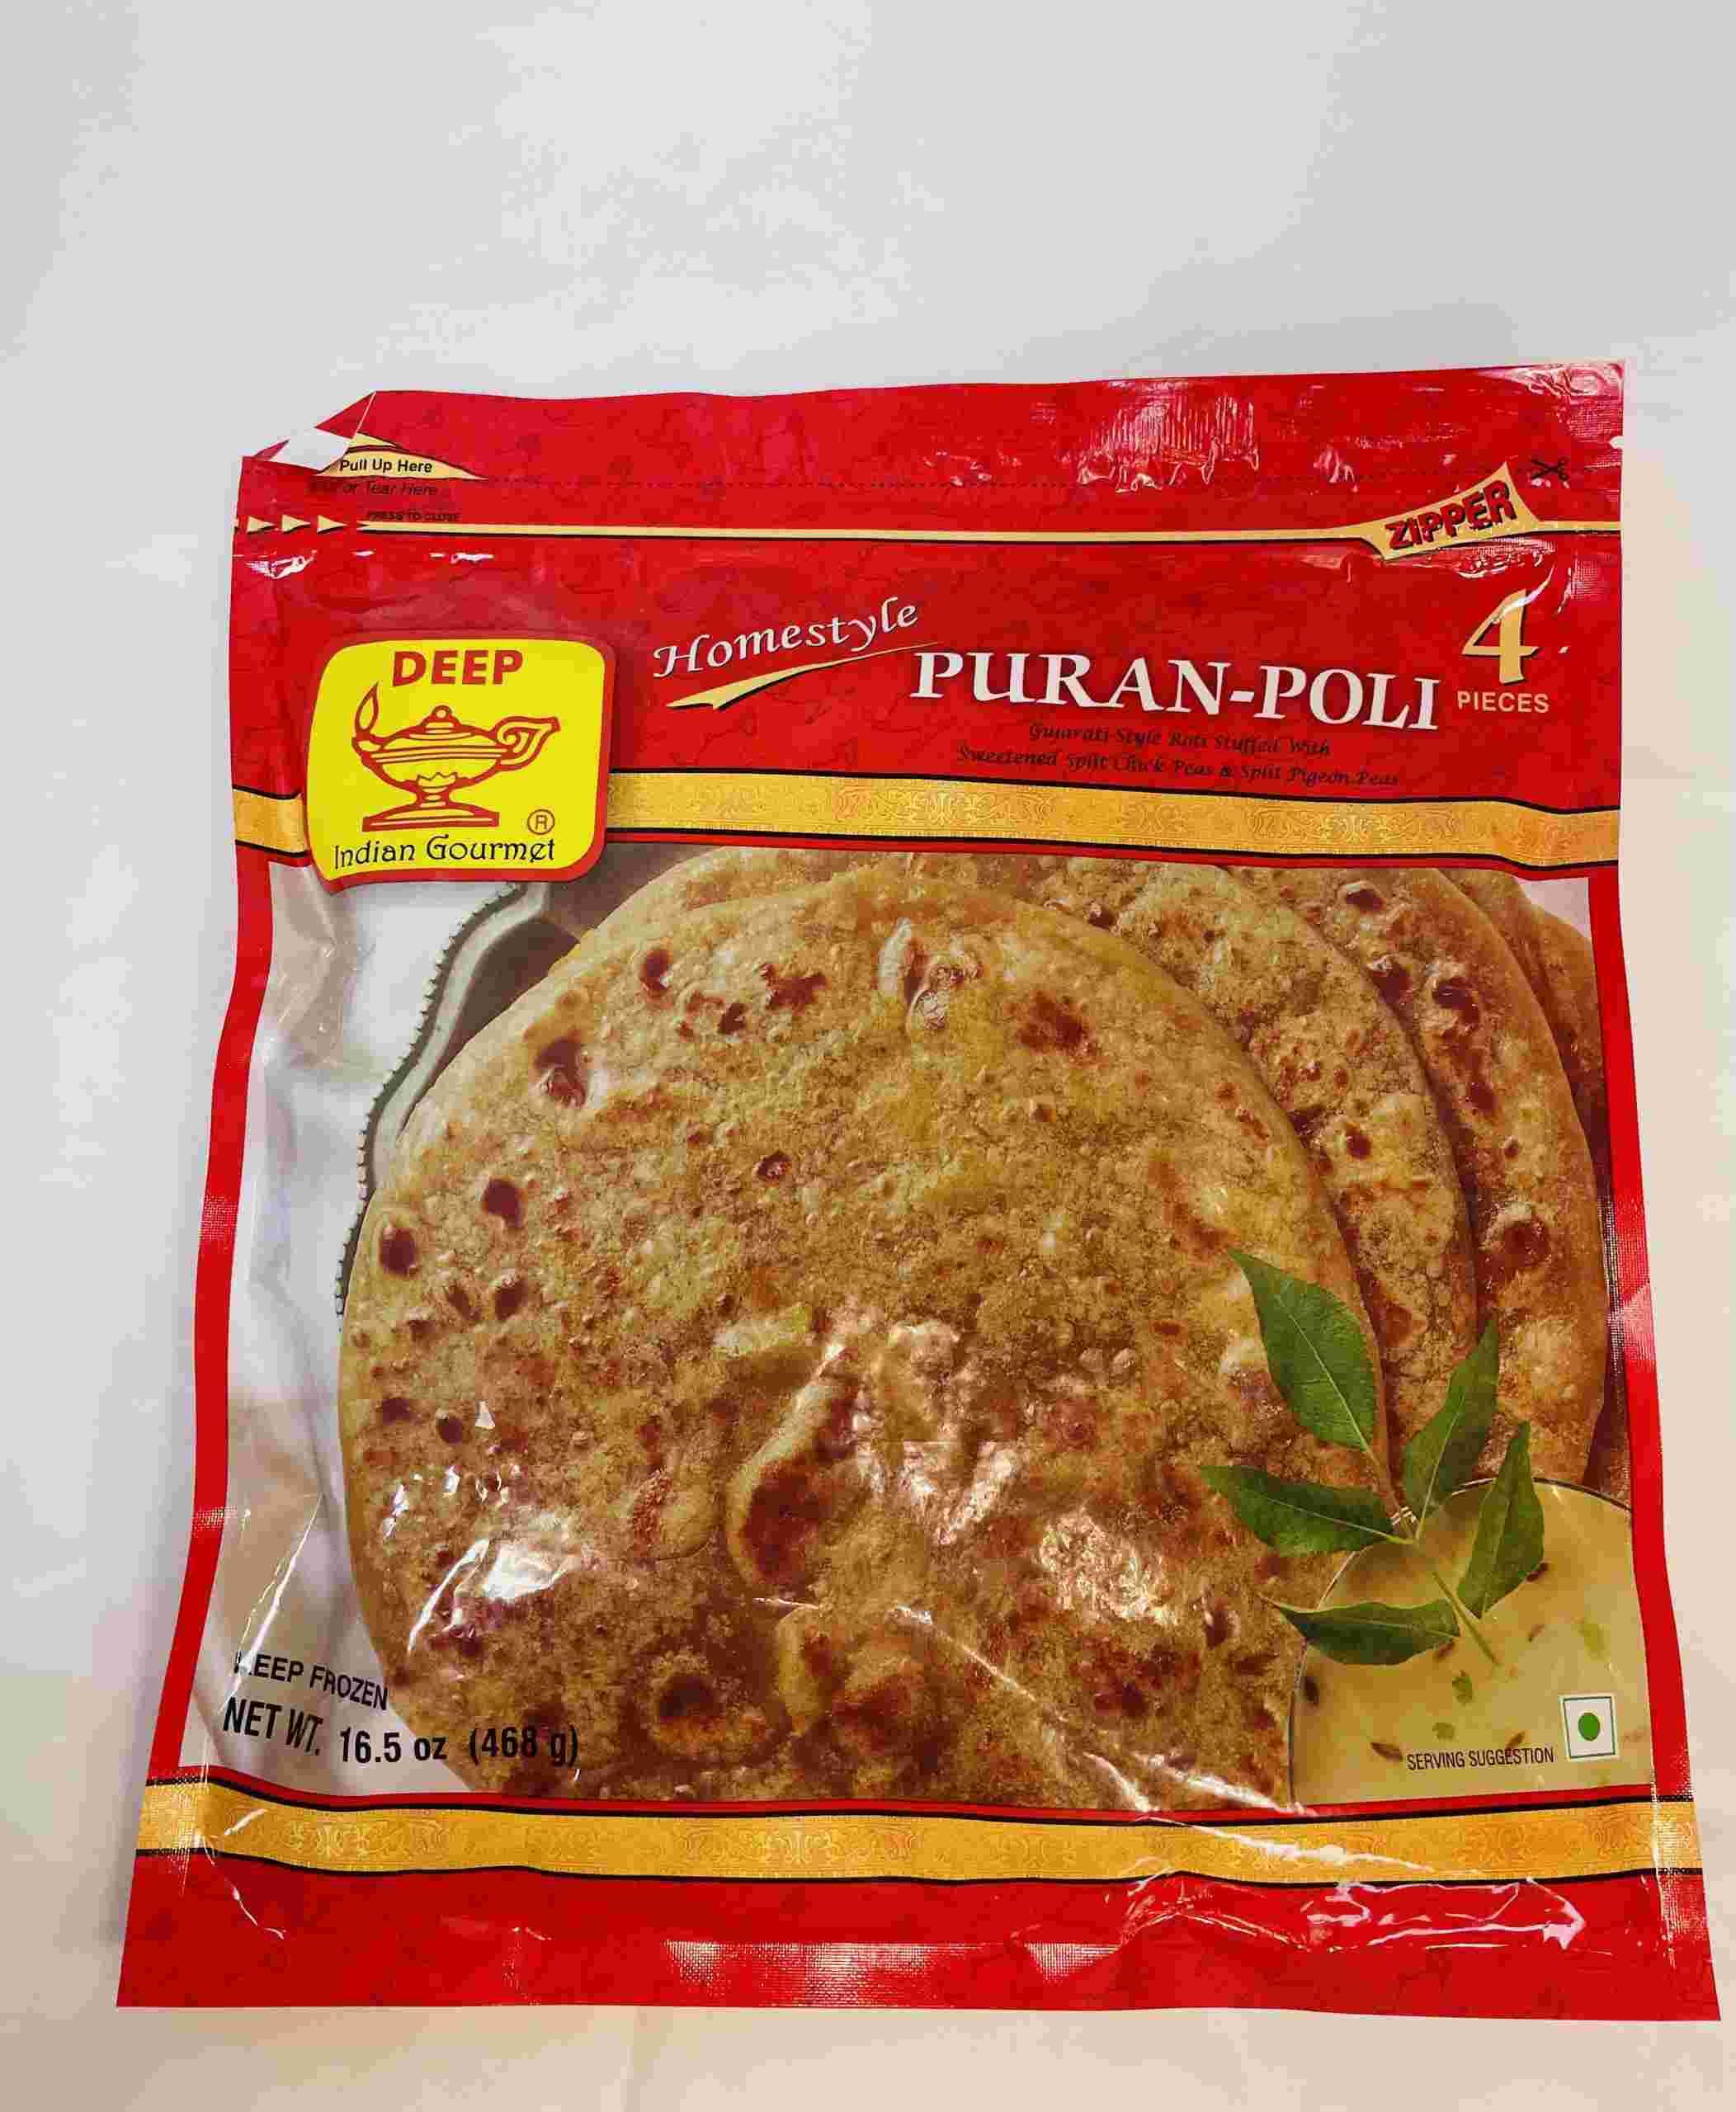 Deep  Puran-Poli 4 Pieces